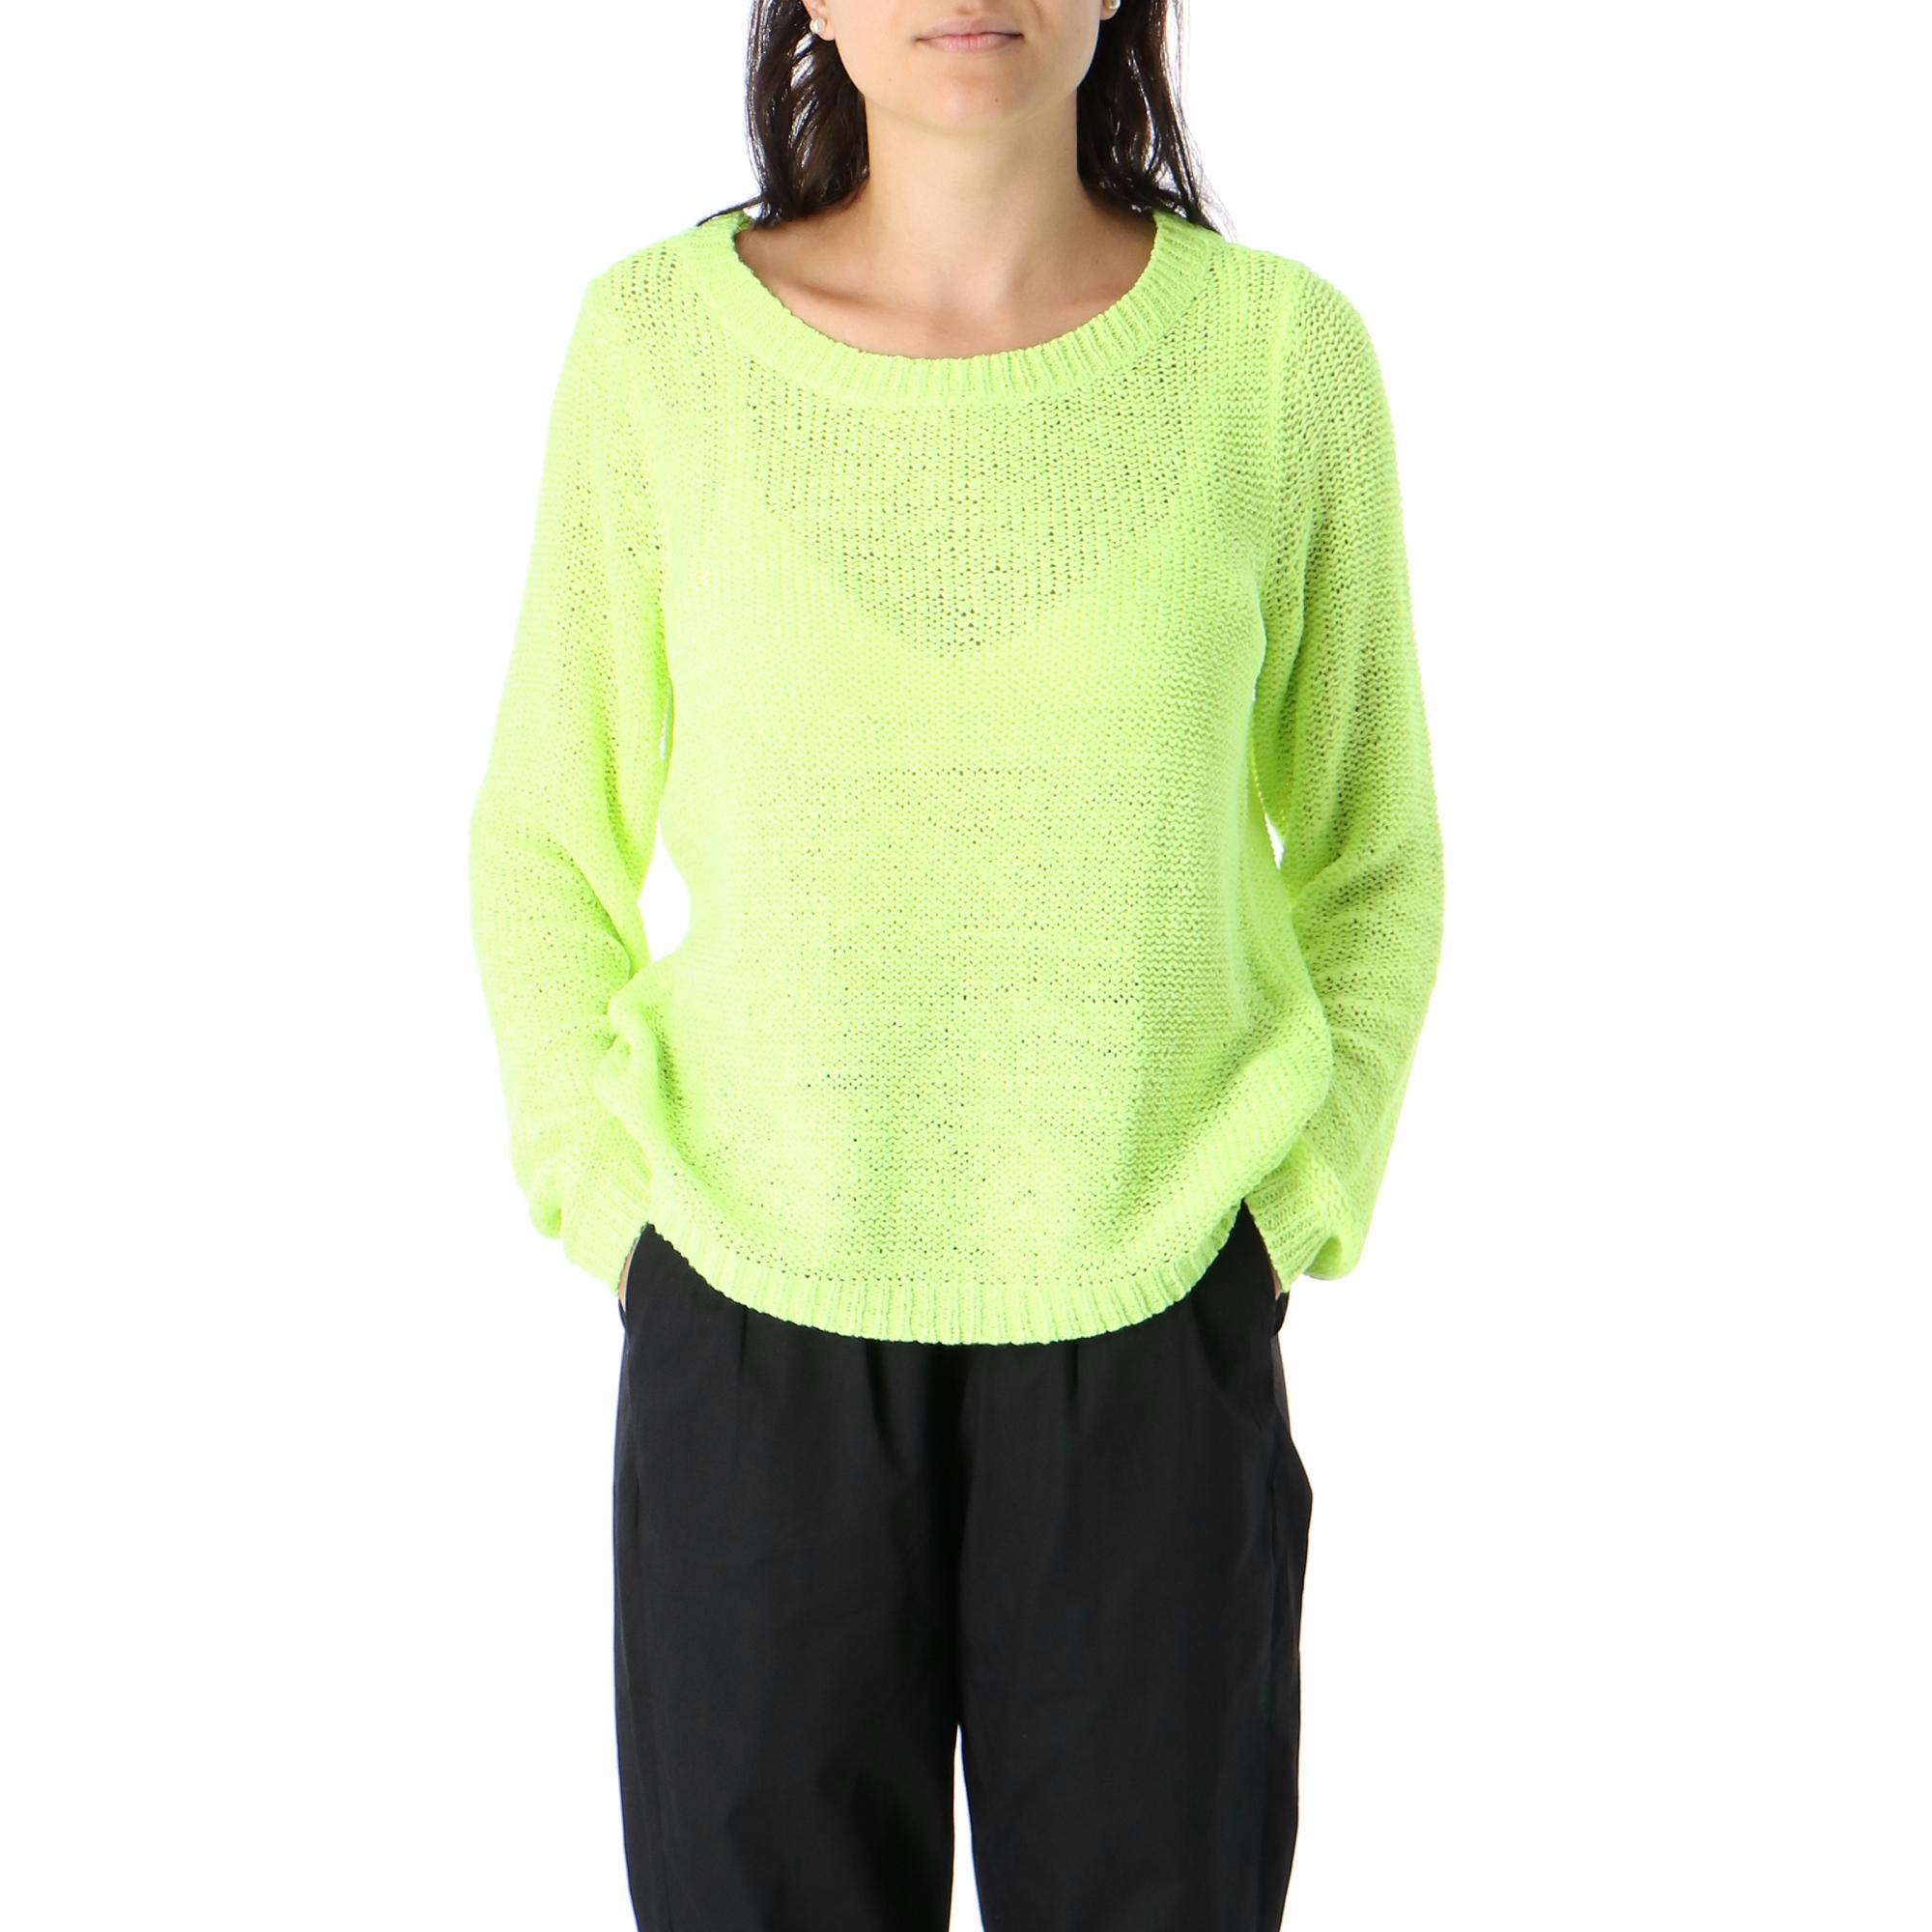 Only Geena Ls Neon Pullover Neon yellow